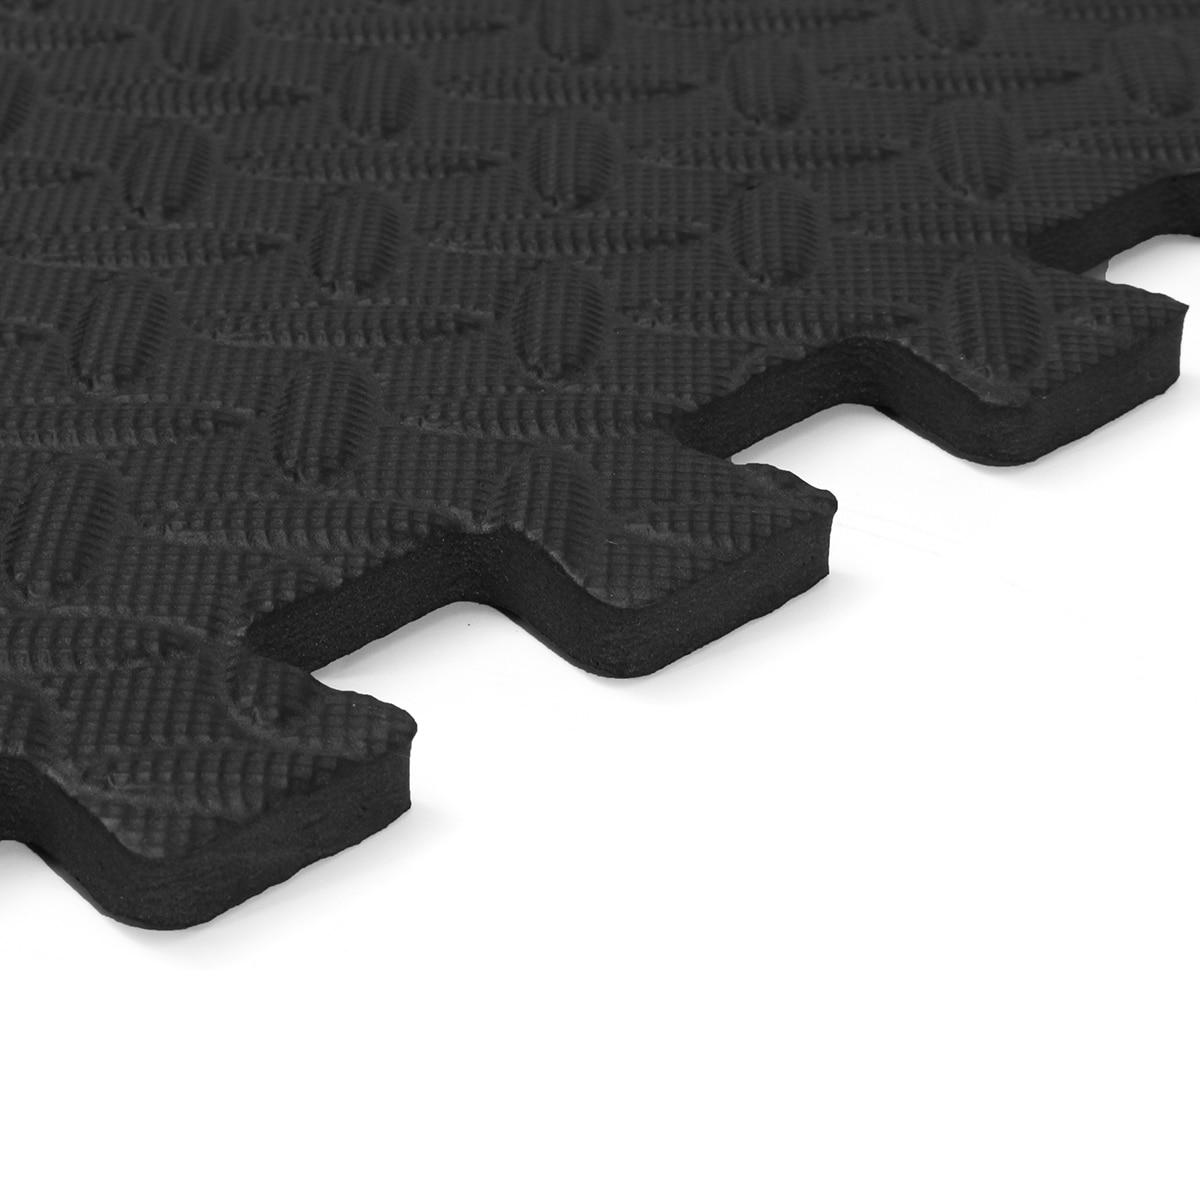 10 PCS EVA Rubber Foam Play Mat Camping Gym Mat Kids Fitness Exercise Floor Carpet Rug 60x60x1cm